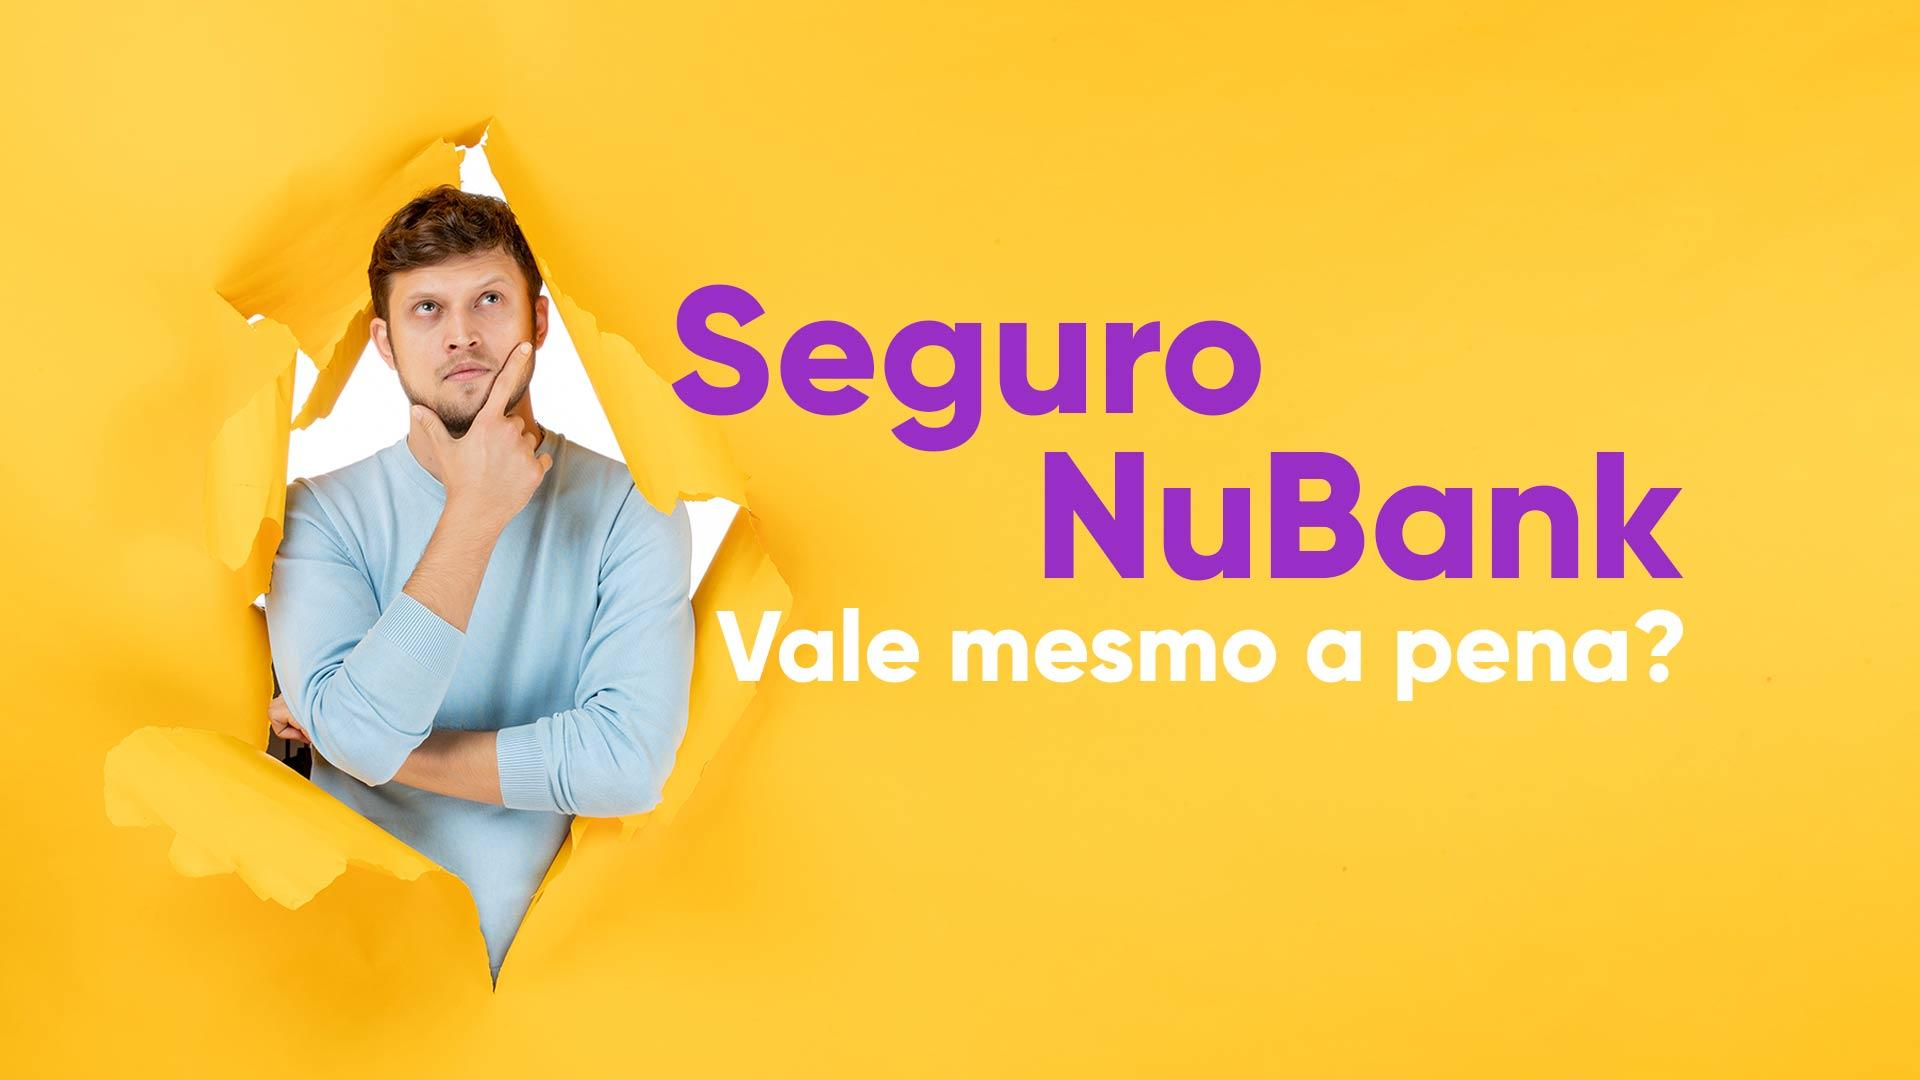 seguro nubank